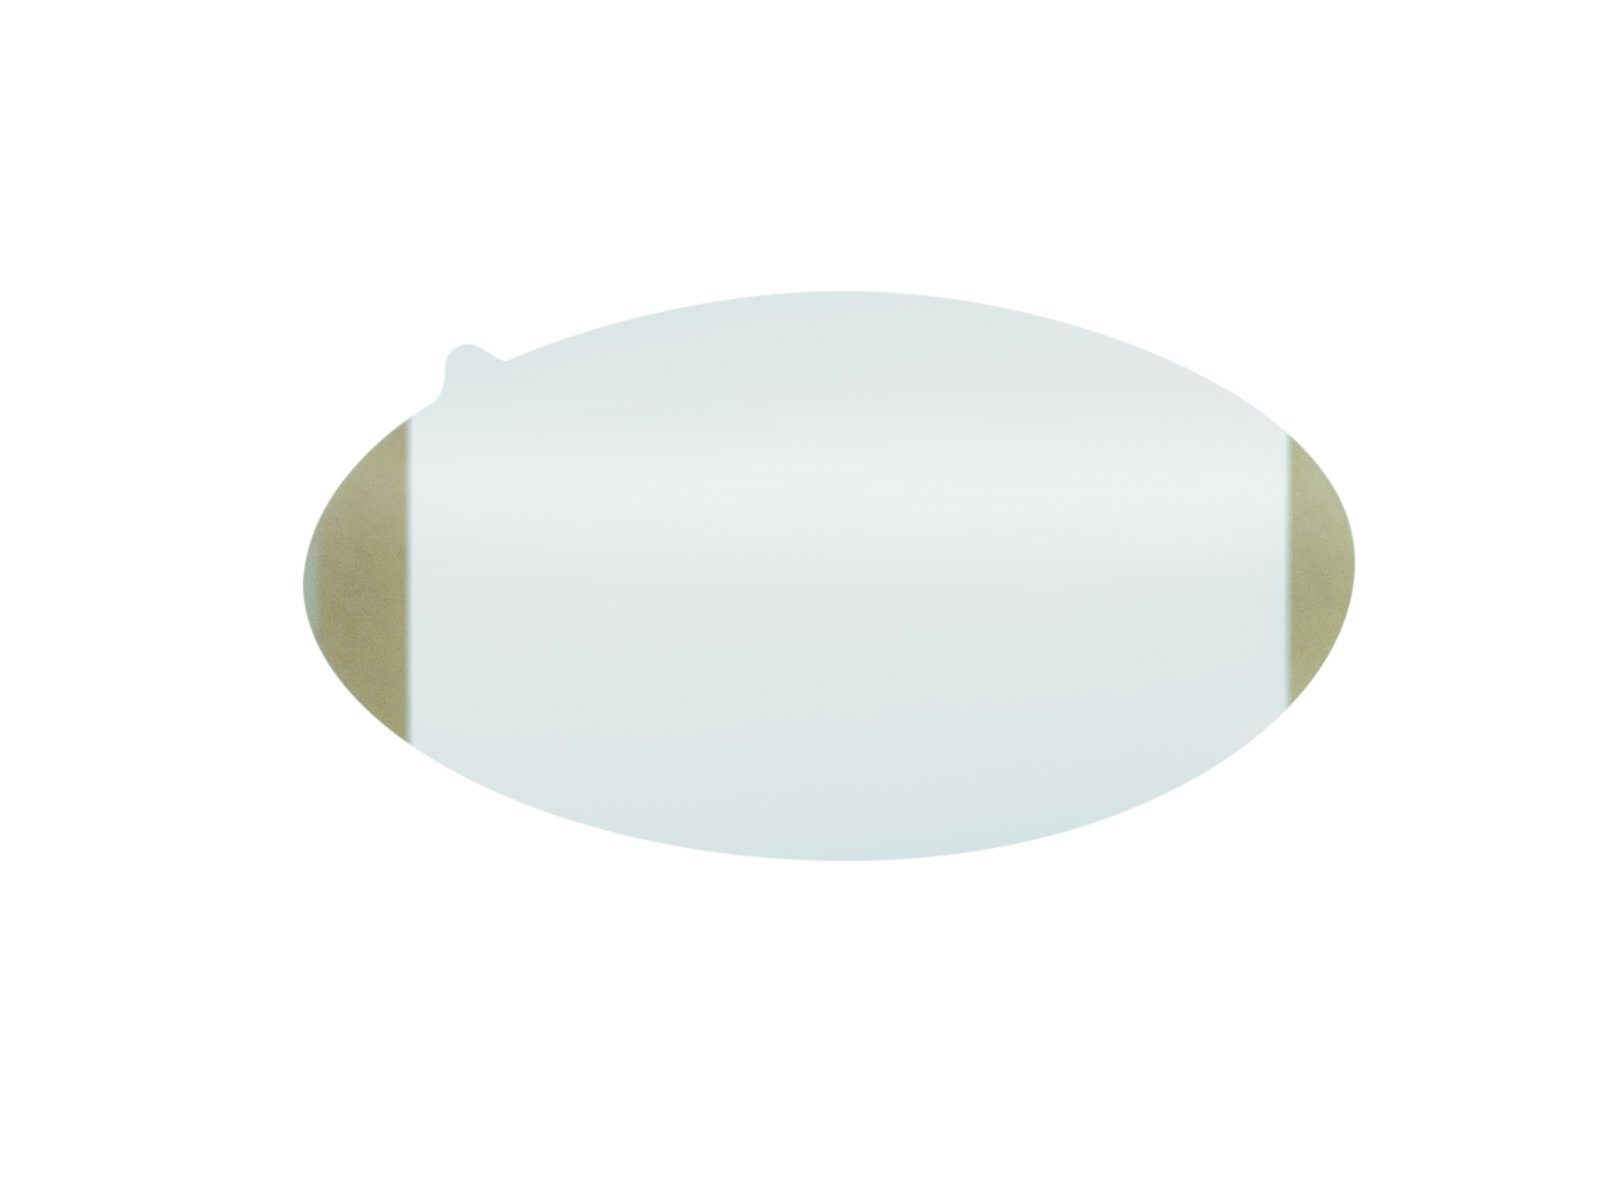 lens covers for M70 full face mask, pack of 20